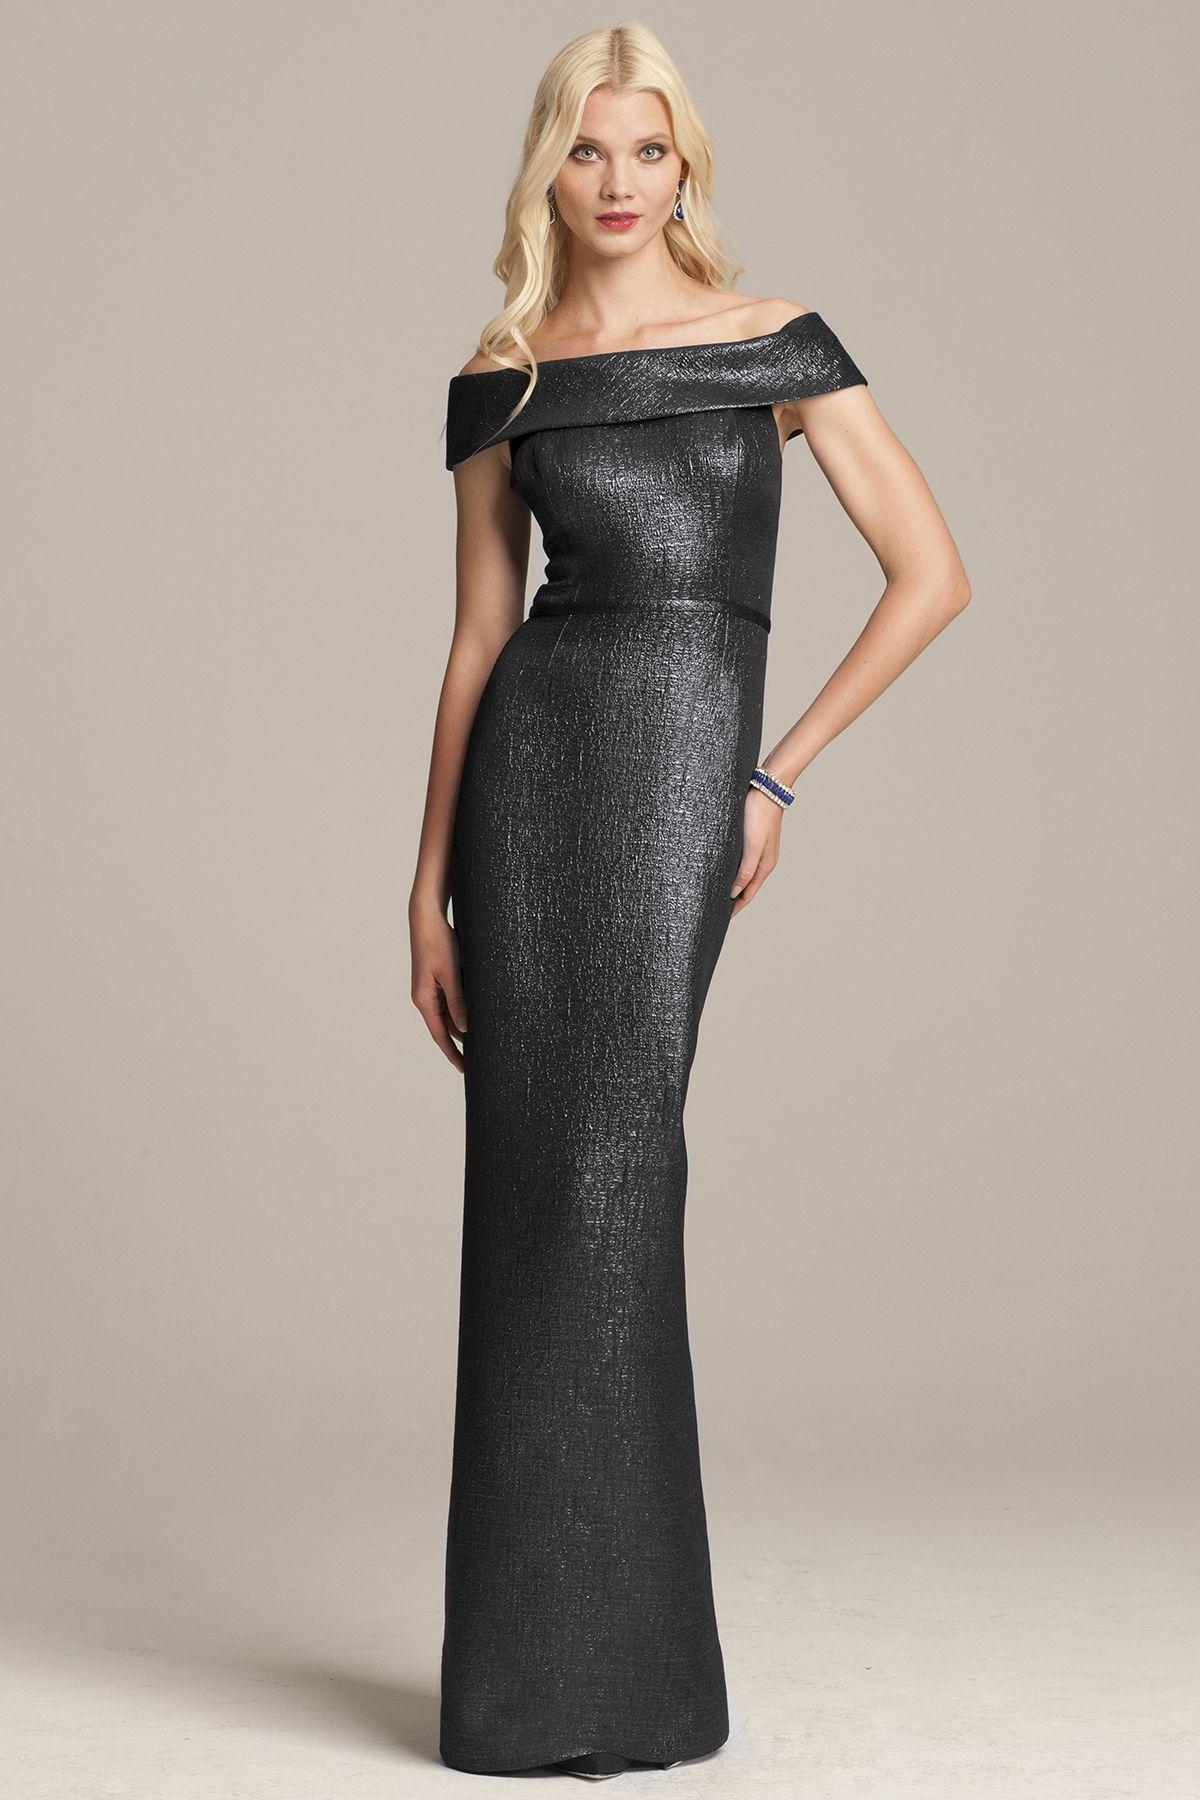 Slate Portrait Collar Gown   Teri Jon   My Style   Pinterest   Slate ...